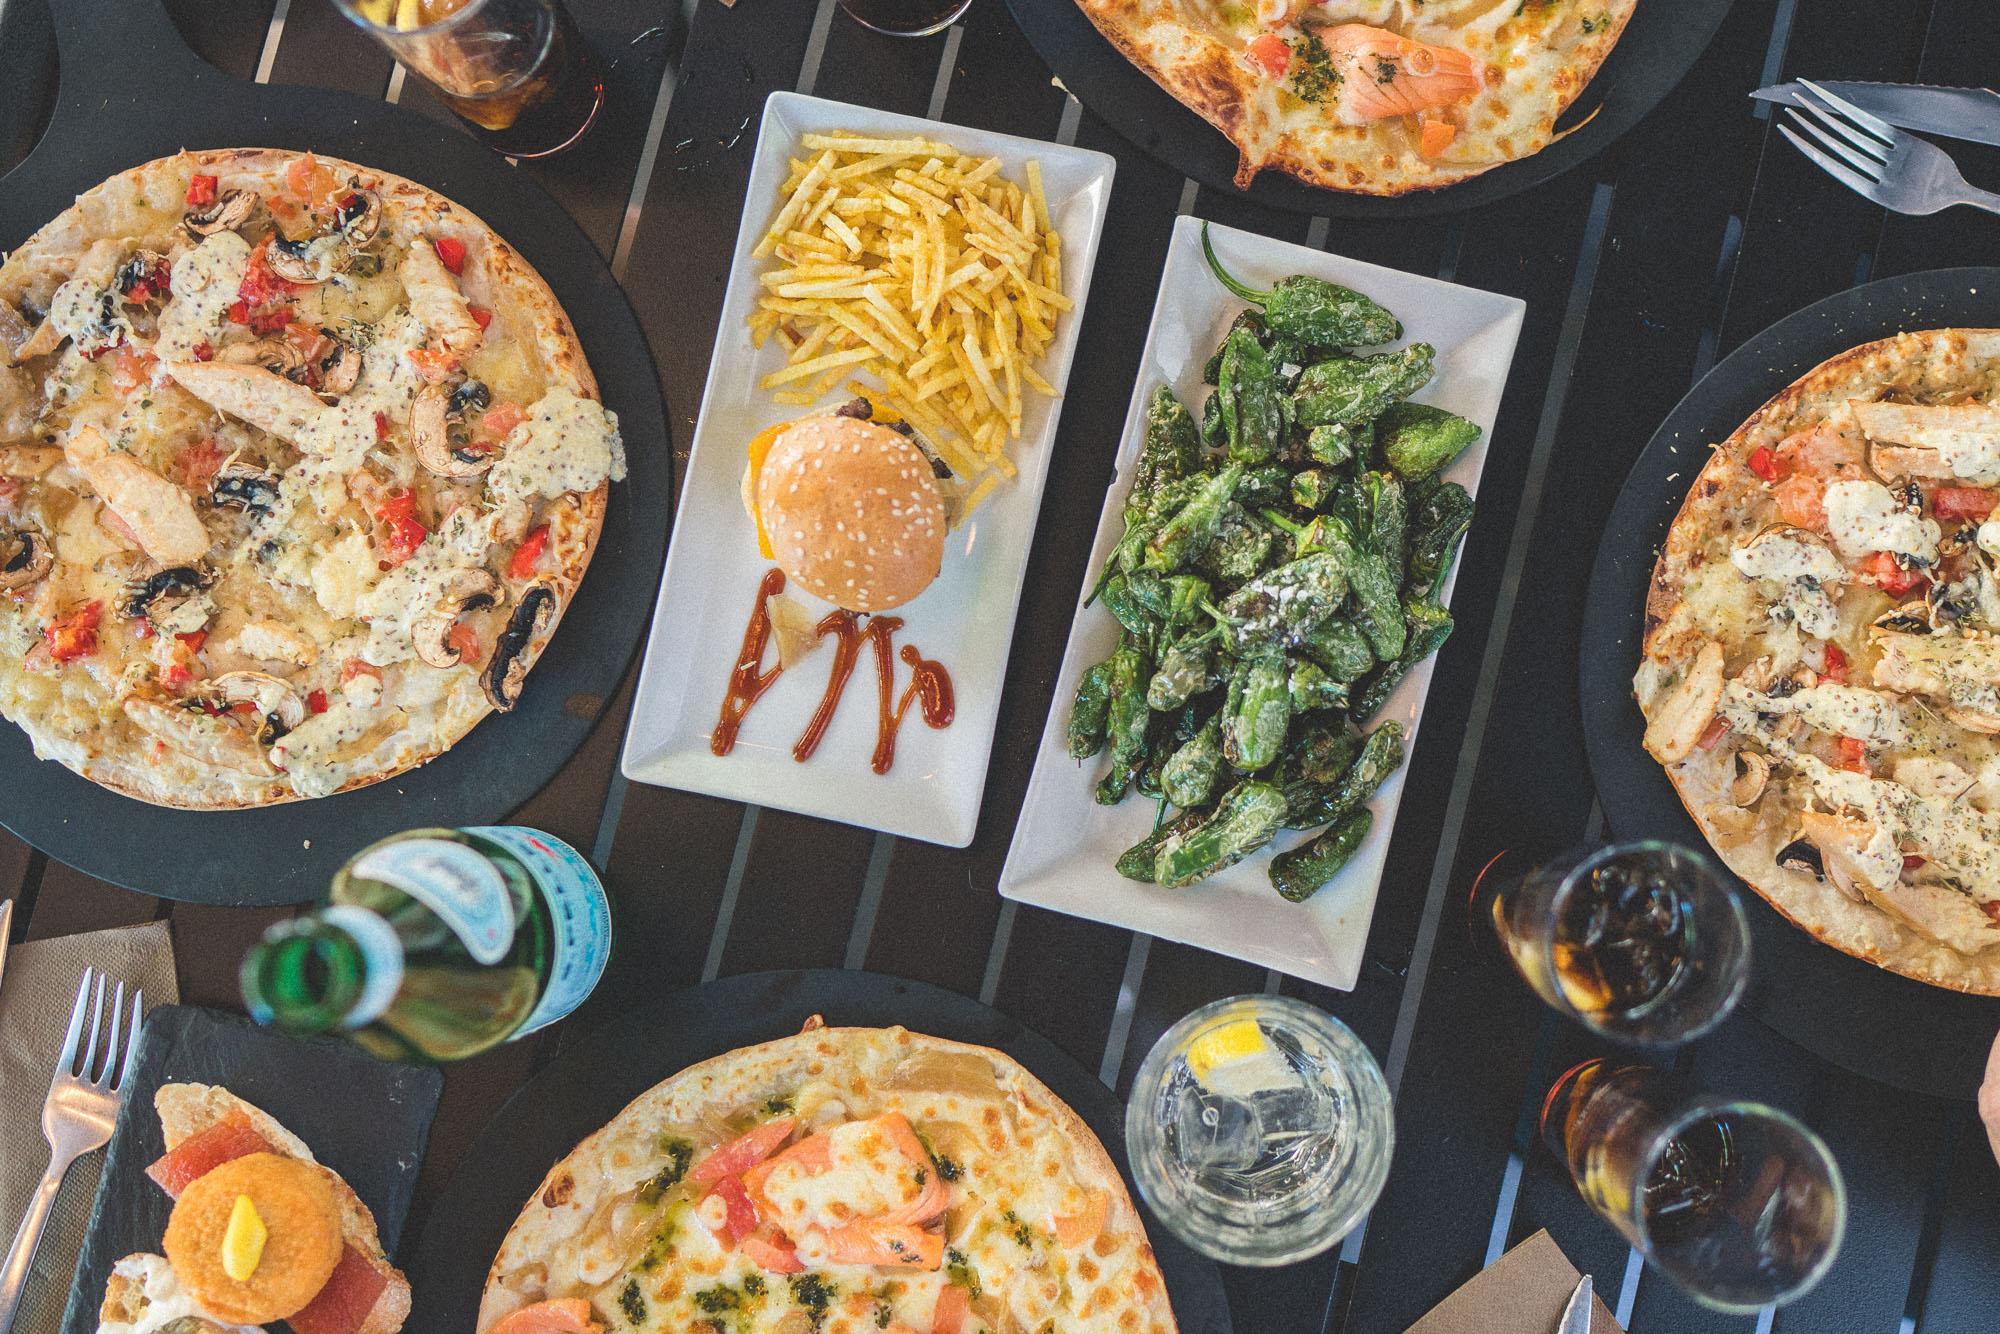 Lunch on La Rambla, Barcelona, Spain